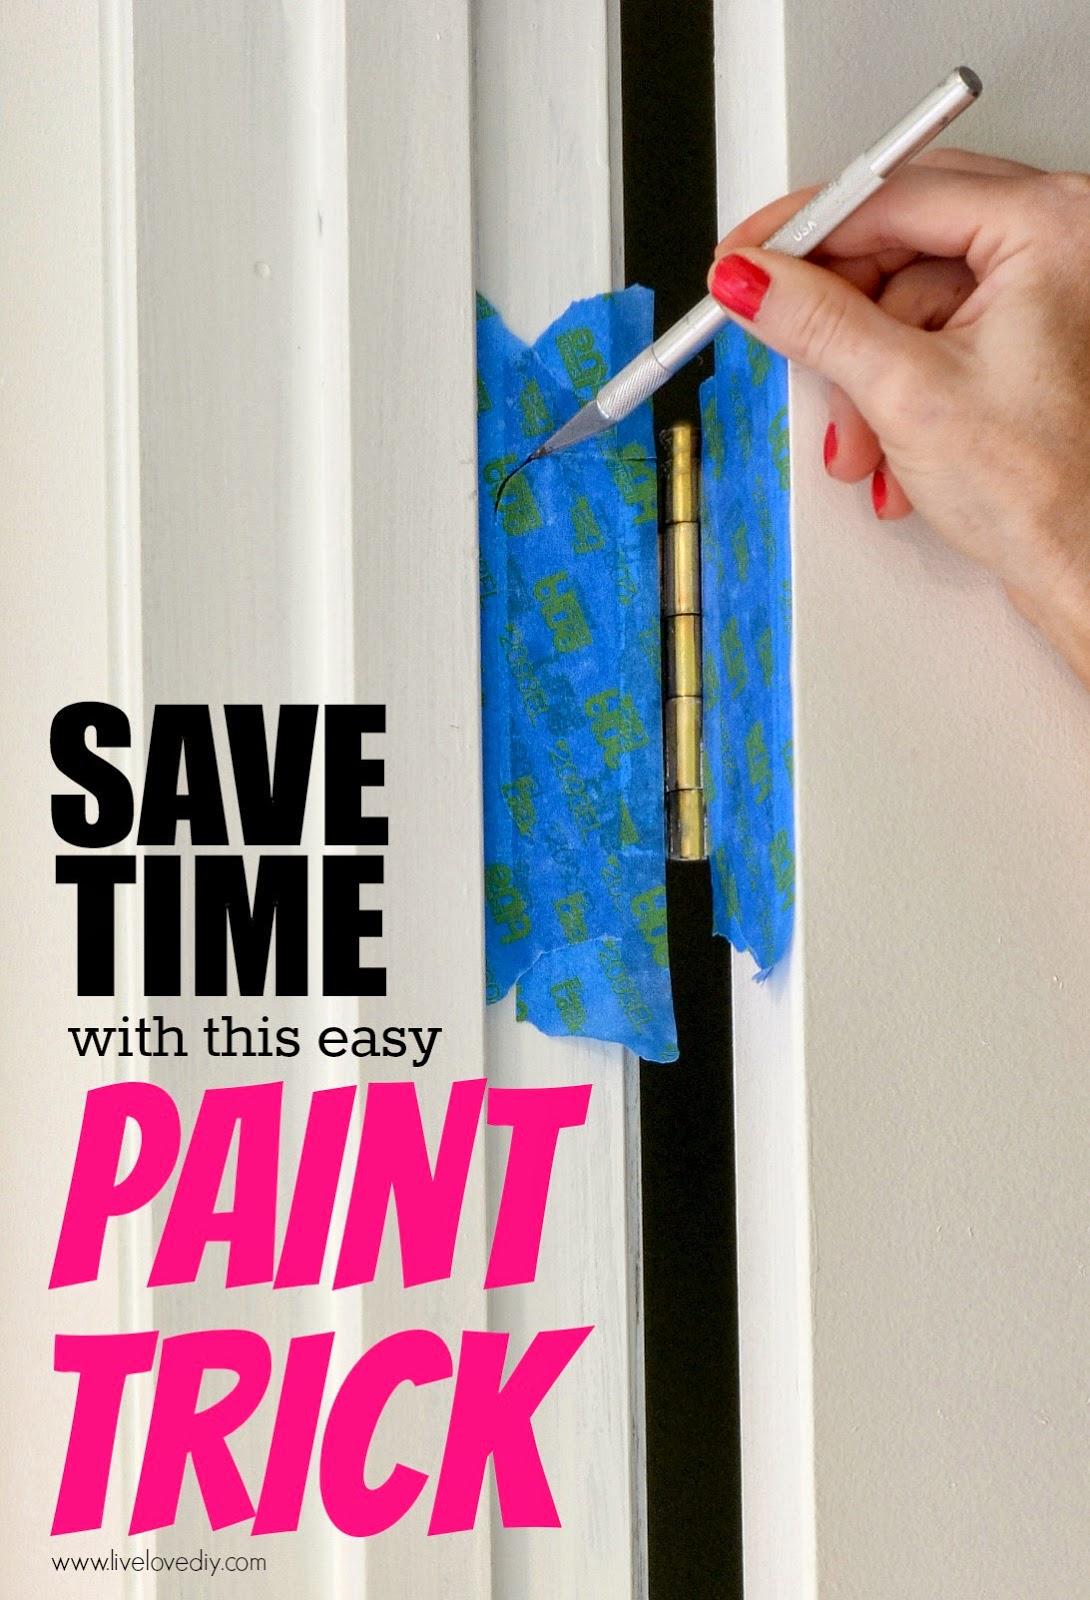 Livelovediy 10 Painting Tips Tricks You Never Knew Part Three